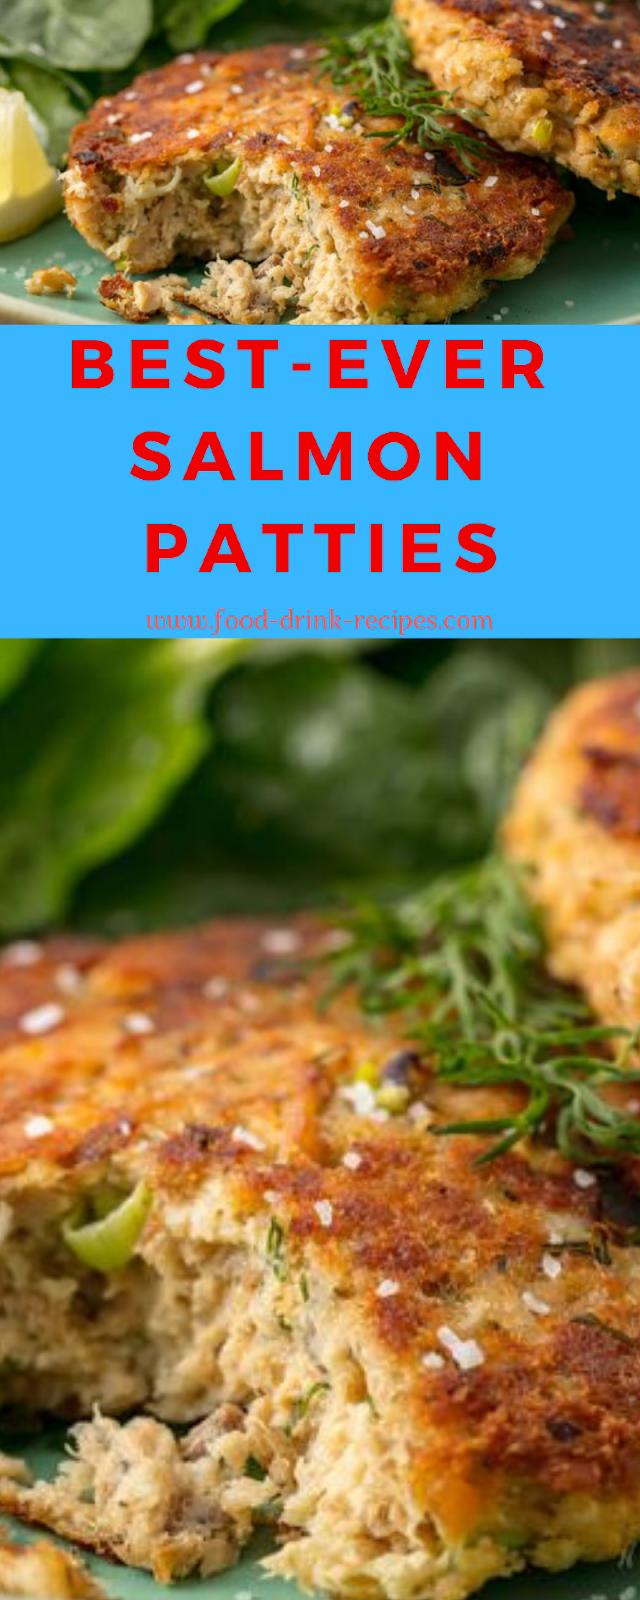 Best-Ever Salmon Patties